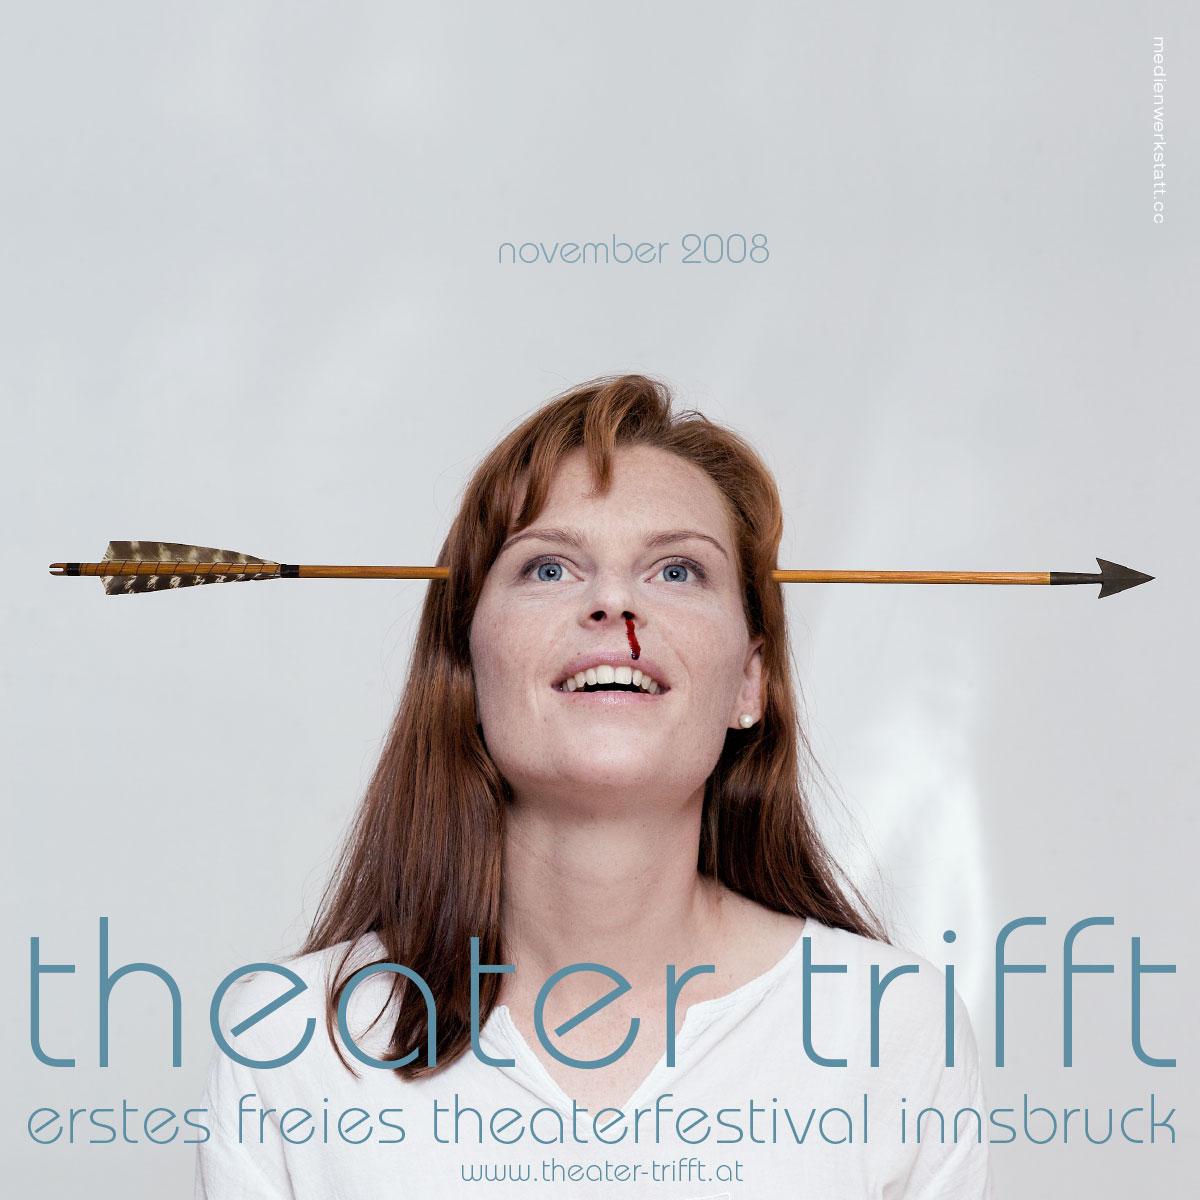 Theaterfestival 2008